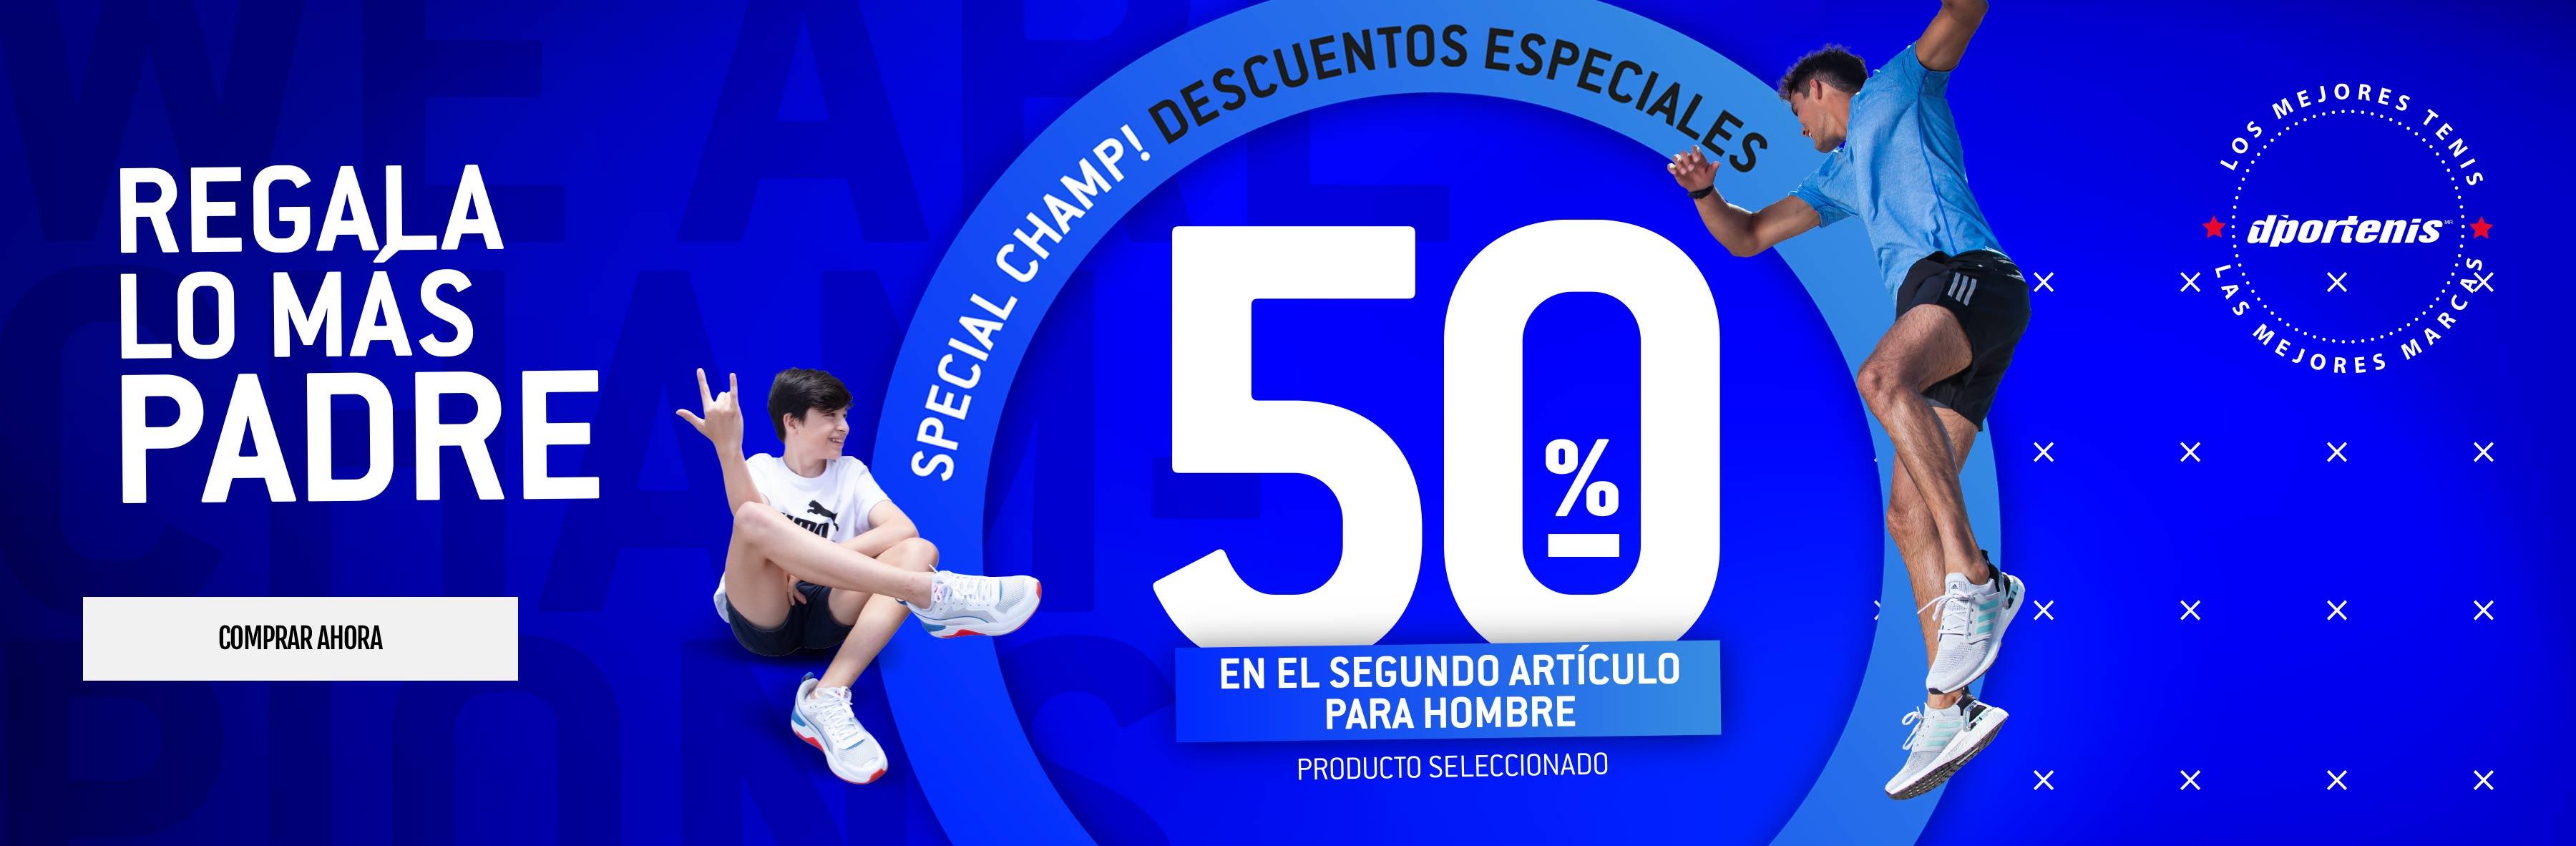 50% SEGUNDO ARTICULO PADRE